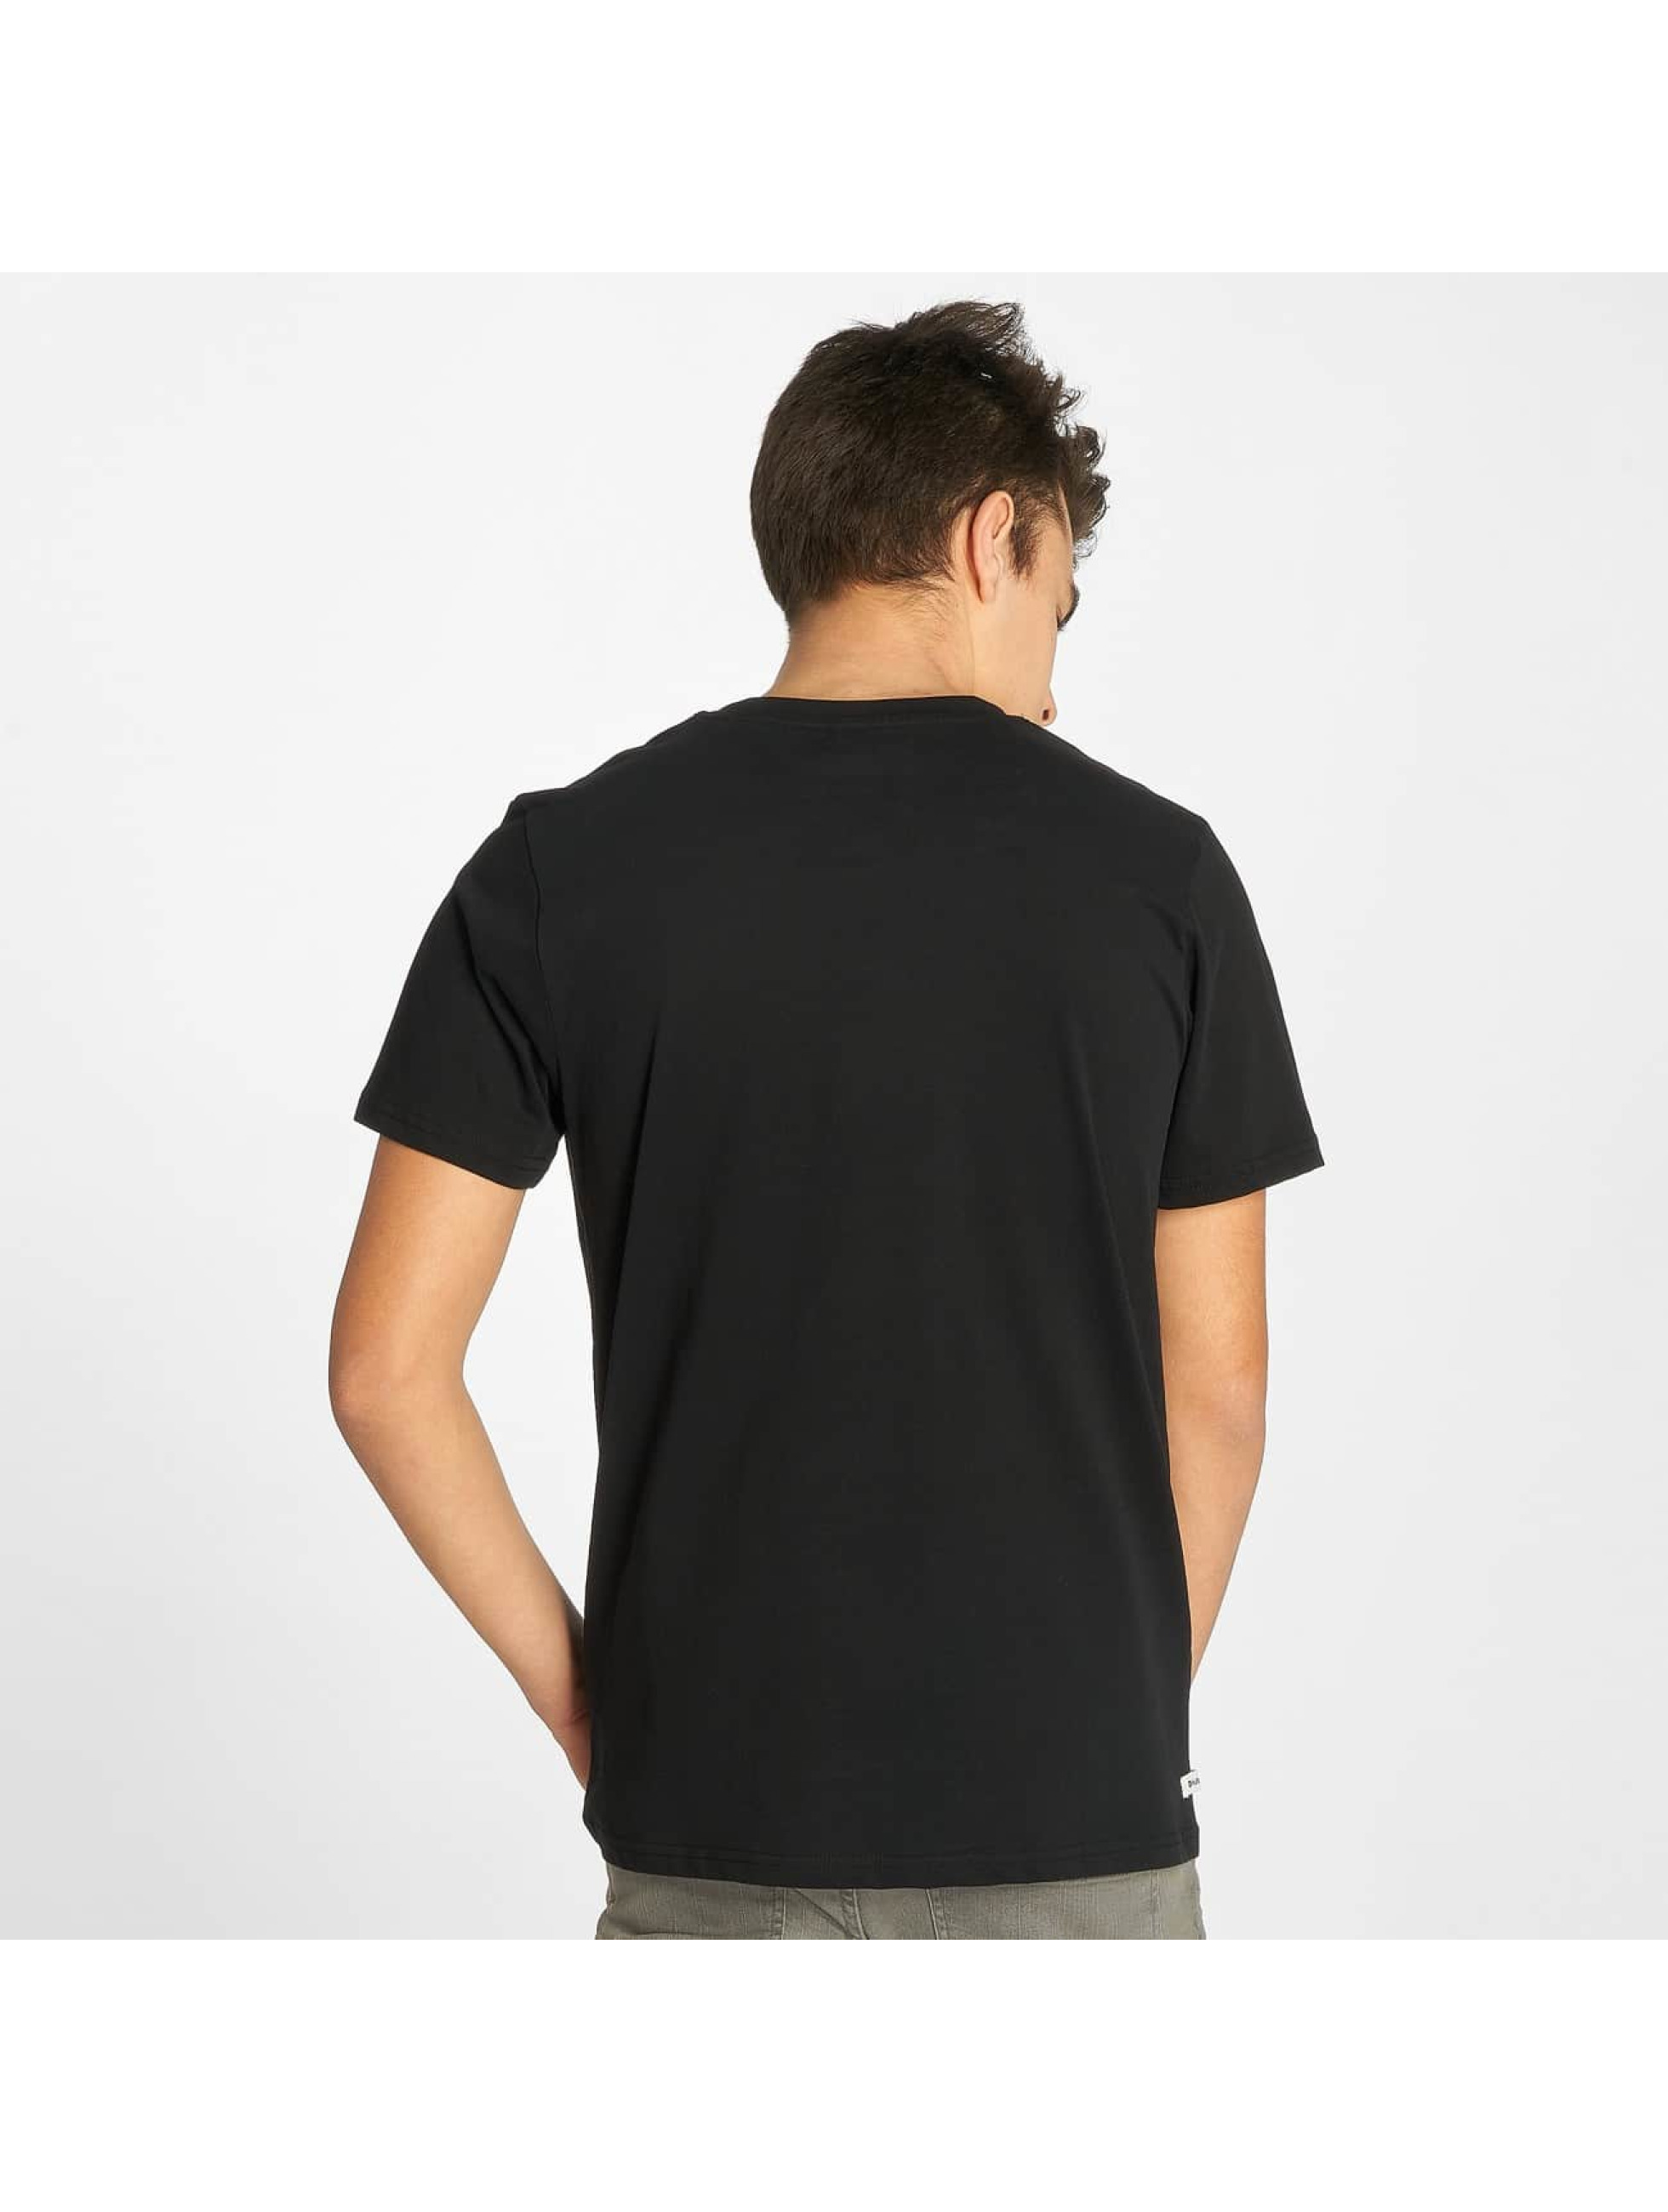 Kulte T-shirt Discovery nero